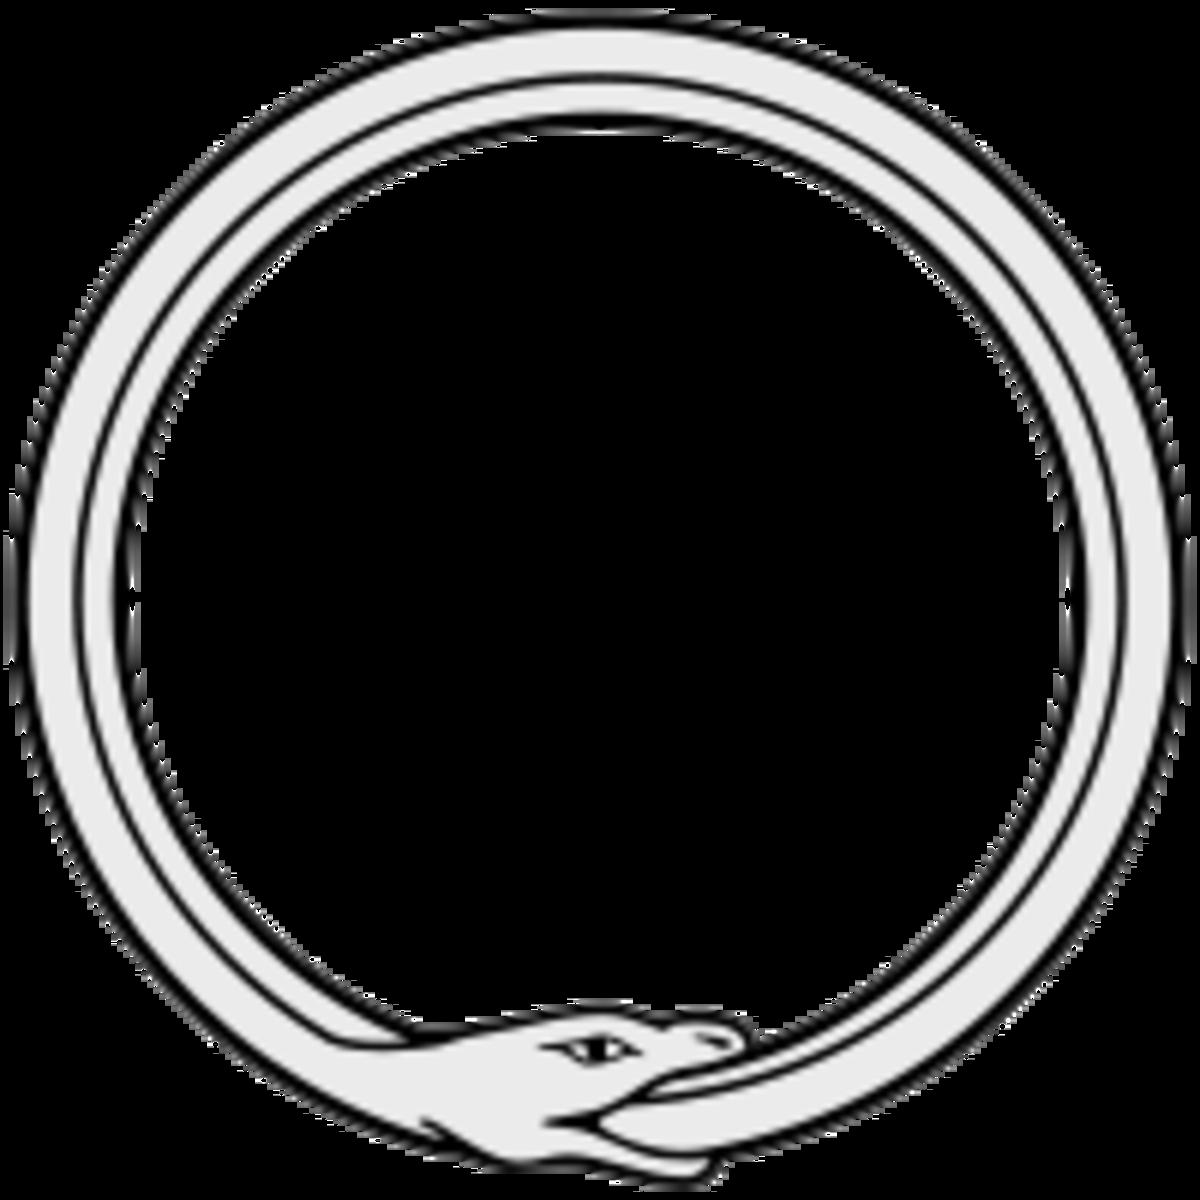 A traditional Ouroboros depiction.